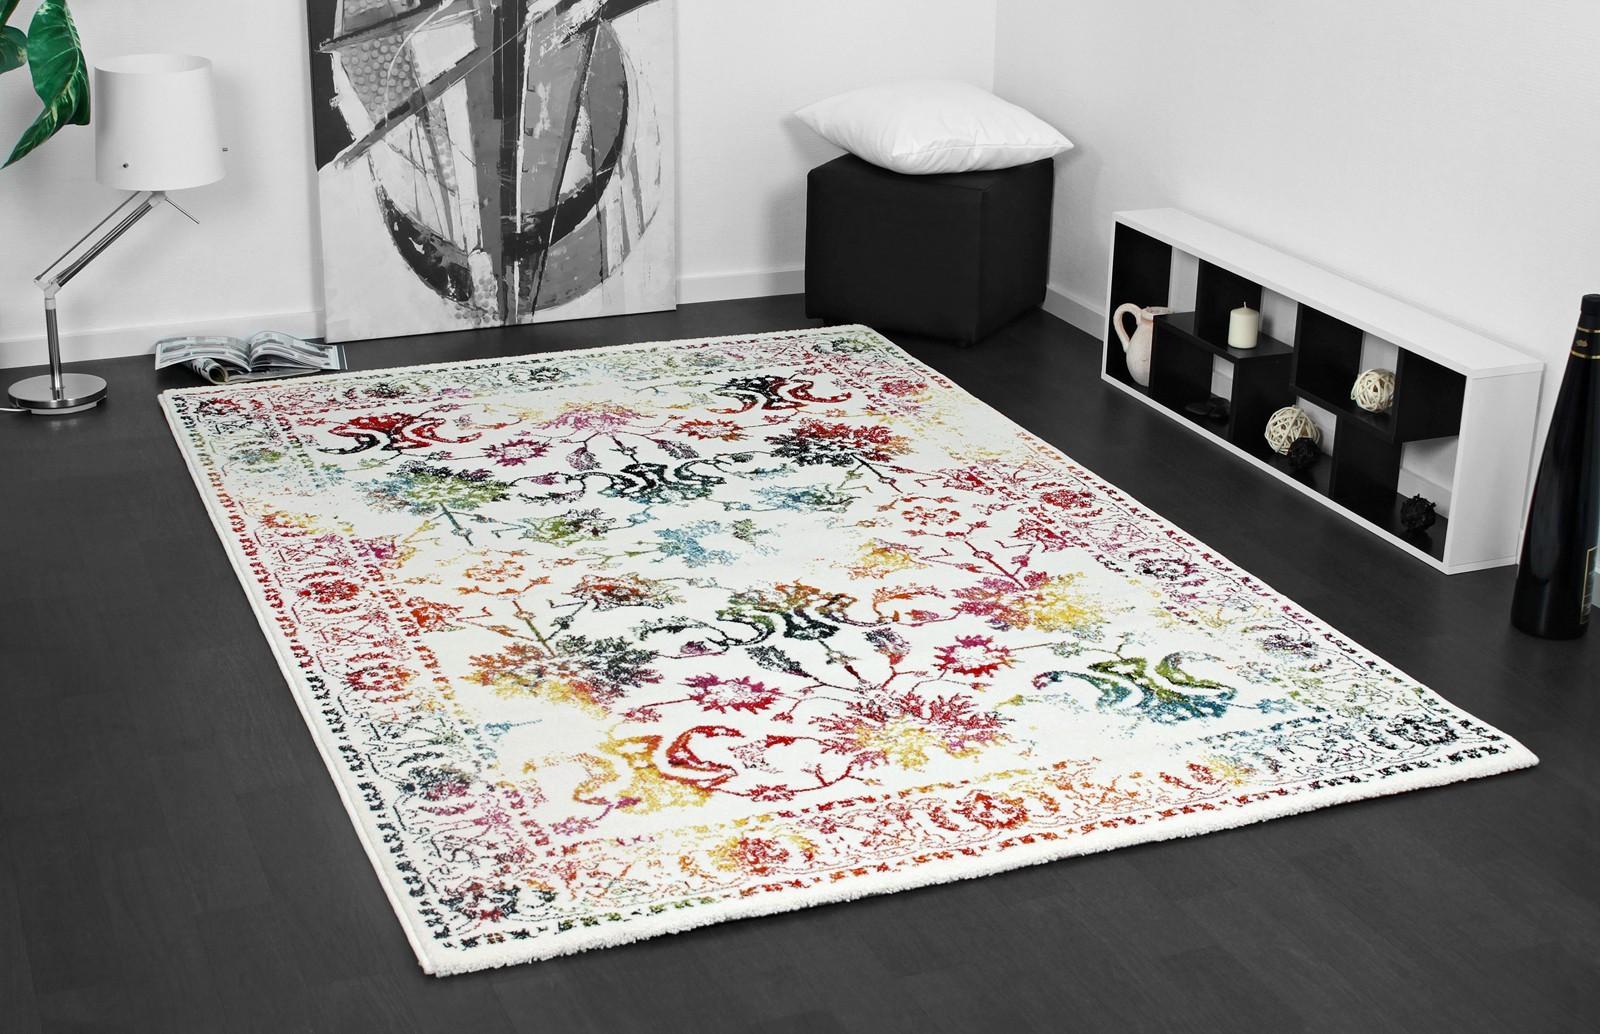 tapis moderne pas cher tapis violet pas cher tapis beige pas cher tapis - Tapis 160x230